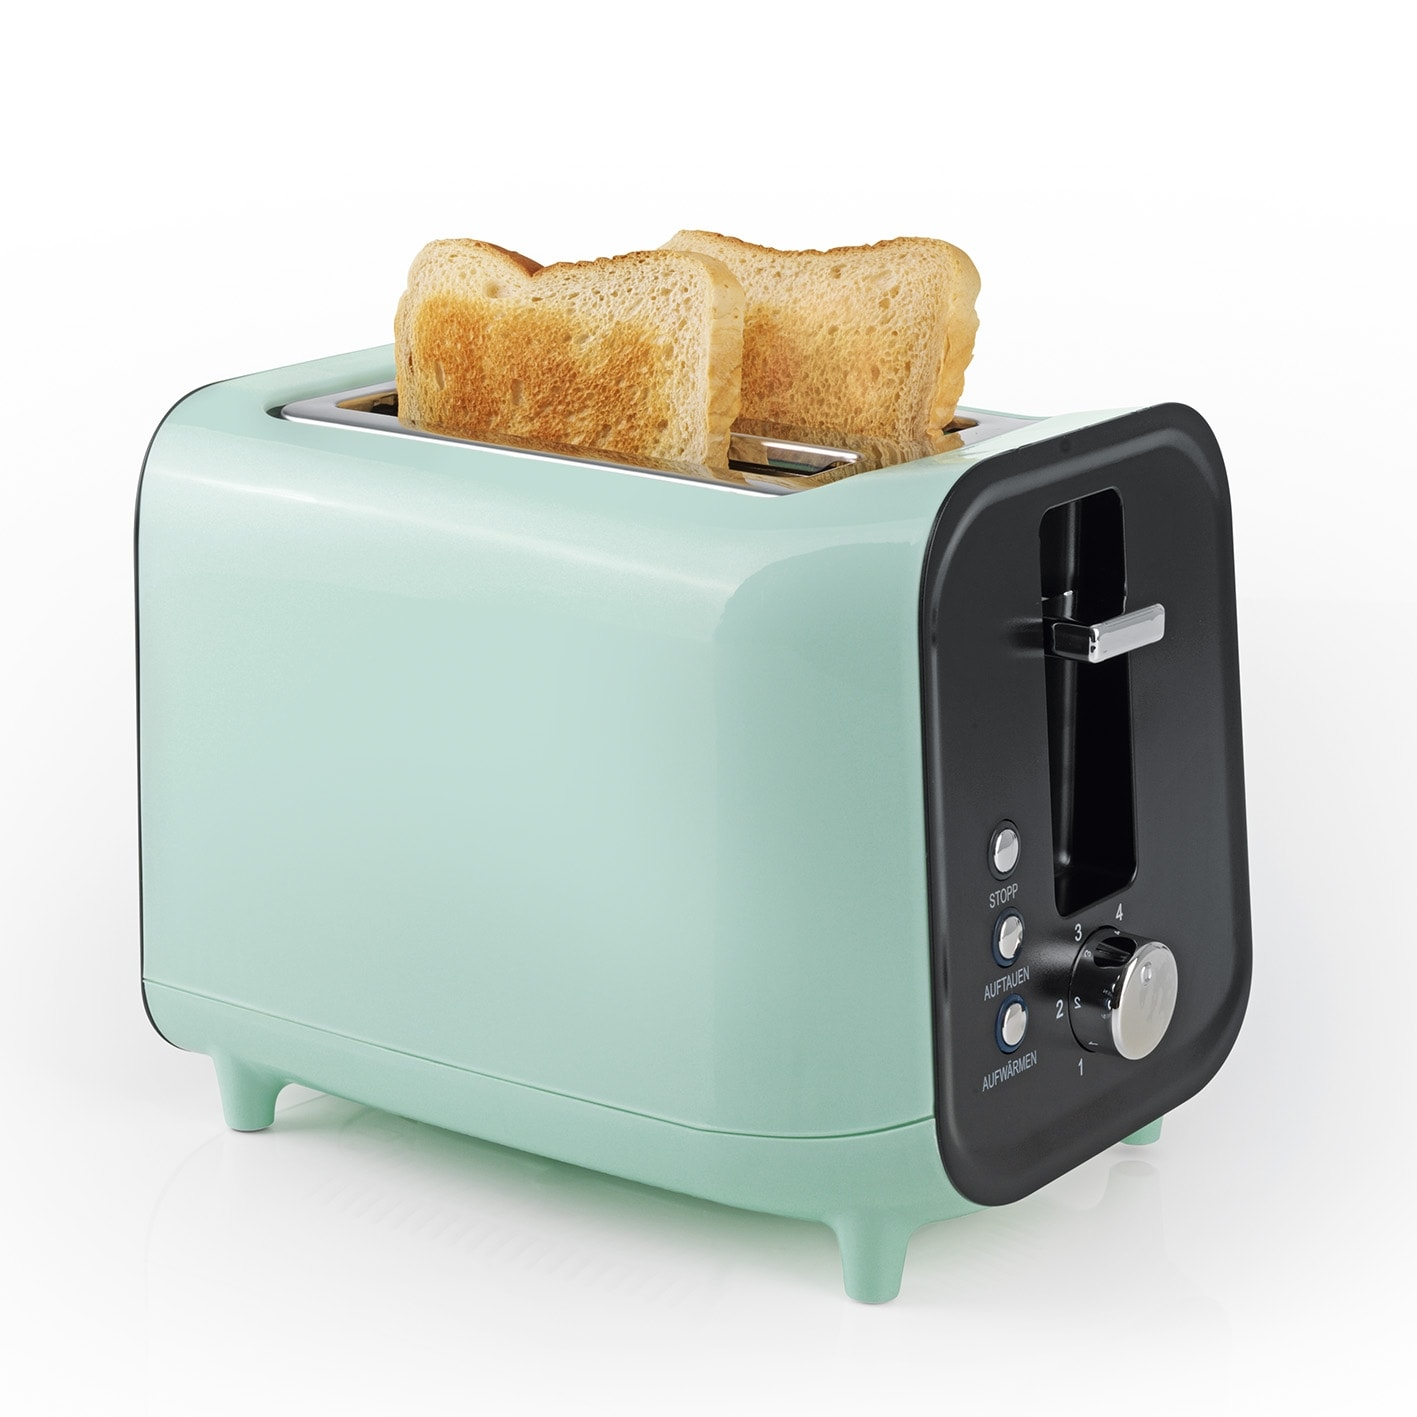 GOURMETmaxx Toaster Retro 800W in Mint